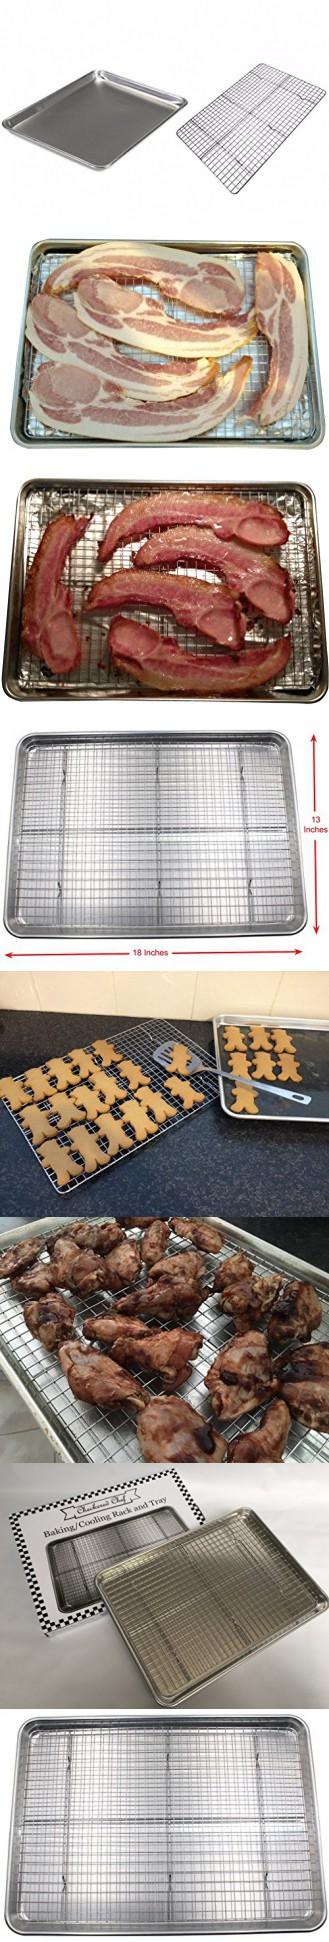 Checkered Chef Half Sheet Pan And Rack Set Aluminum Cookie Sheet